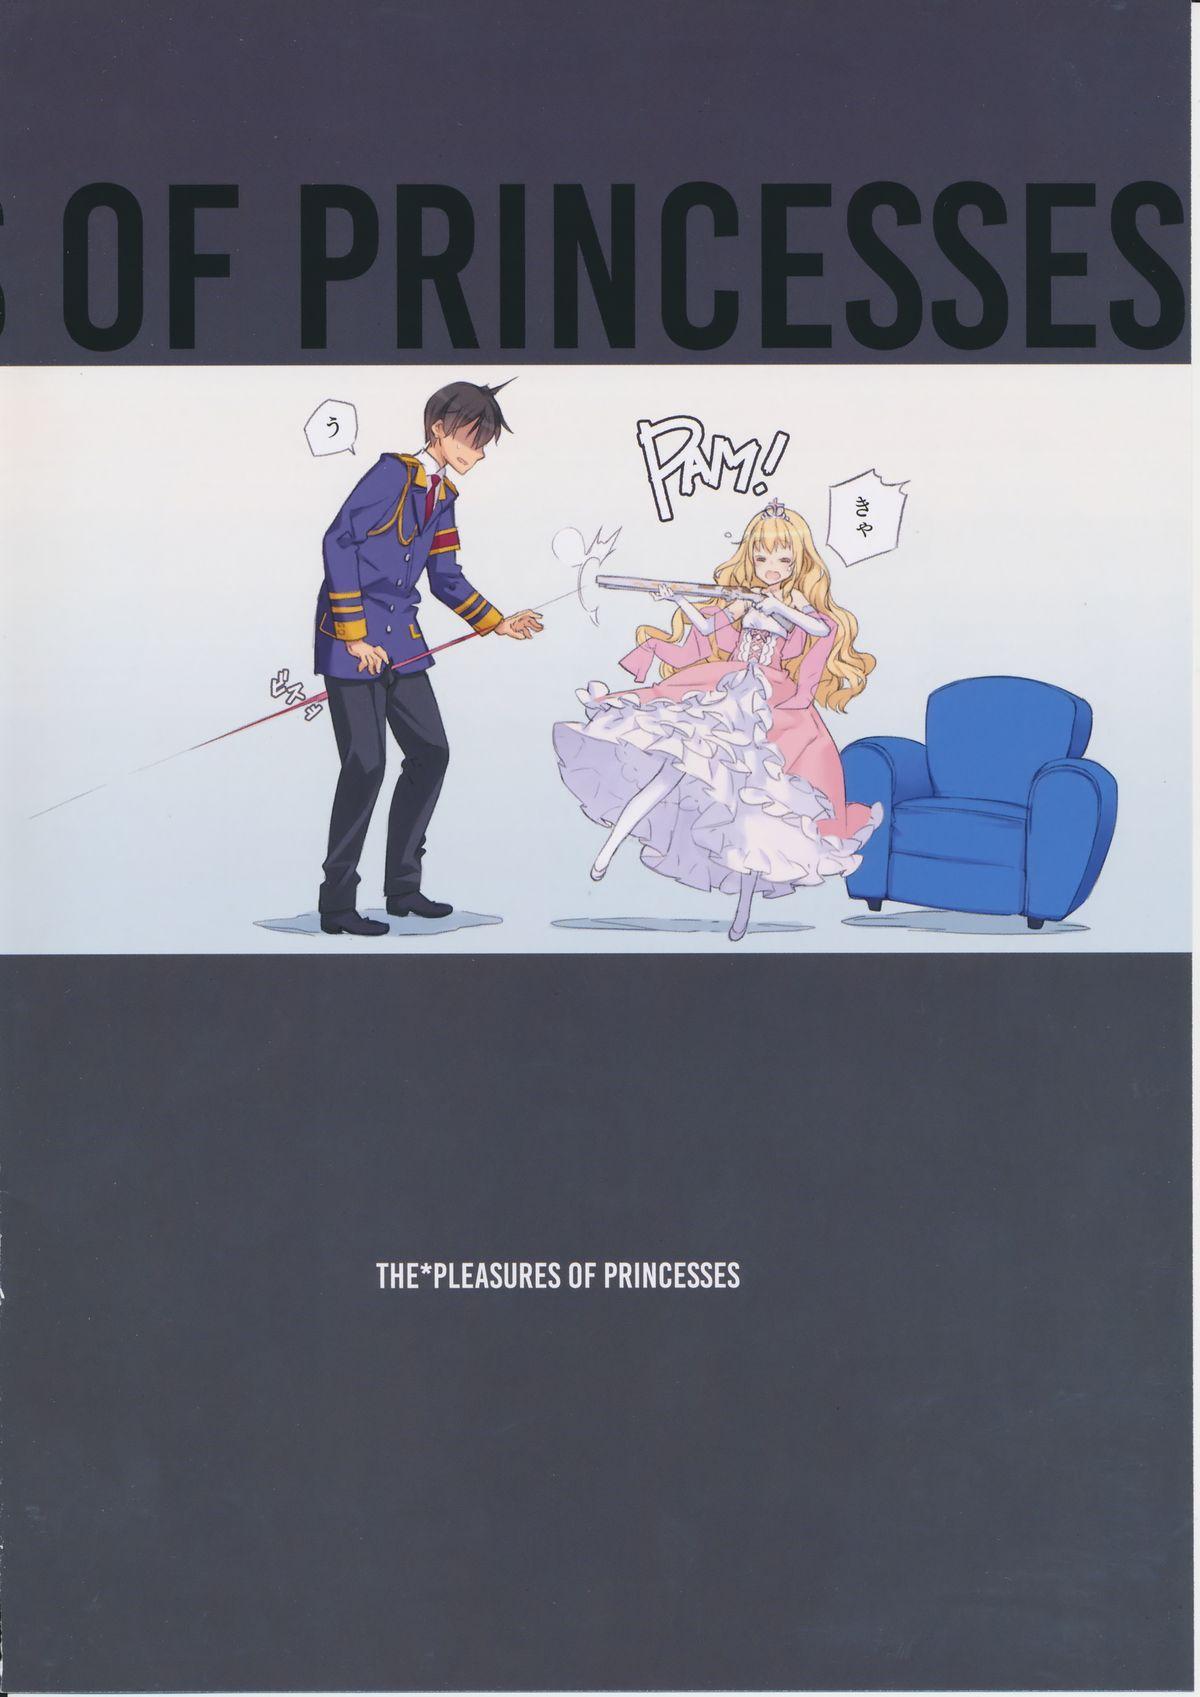 THE PLEASURES OF PRINCESSES 2